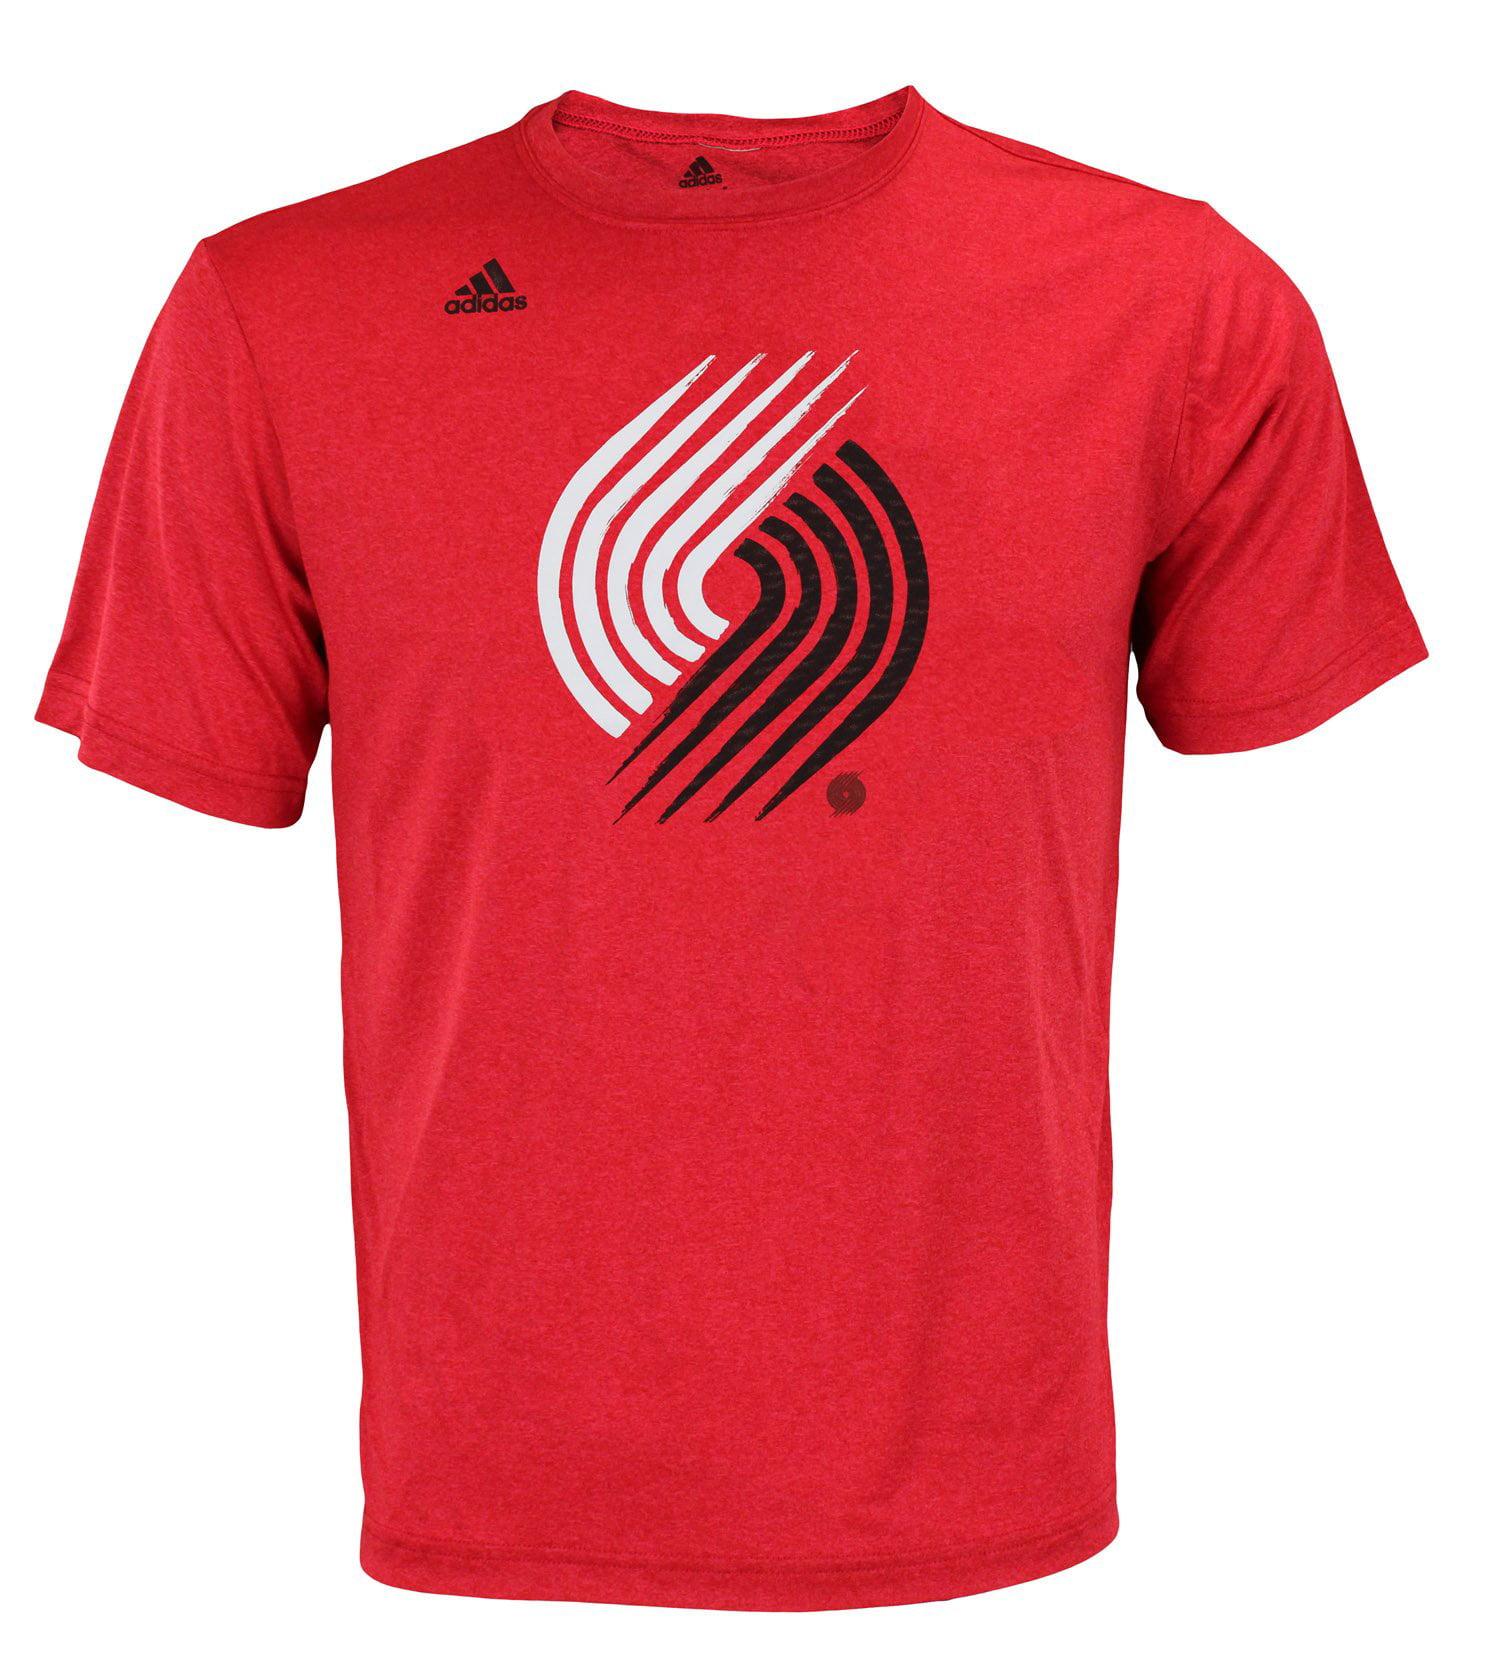 Adidas NBA Men's Portland Trail Blazers Ultra Lightweight Athletic Rush Graphic Tee, Red